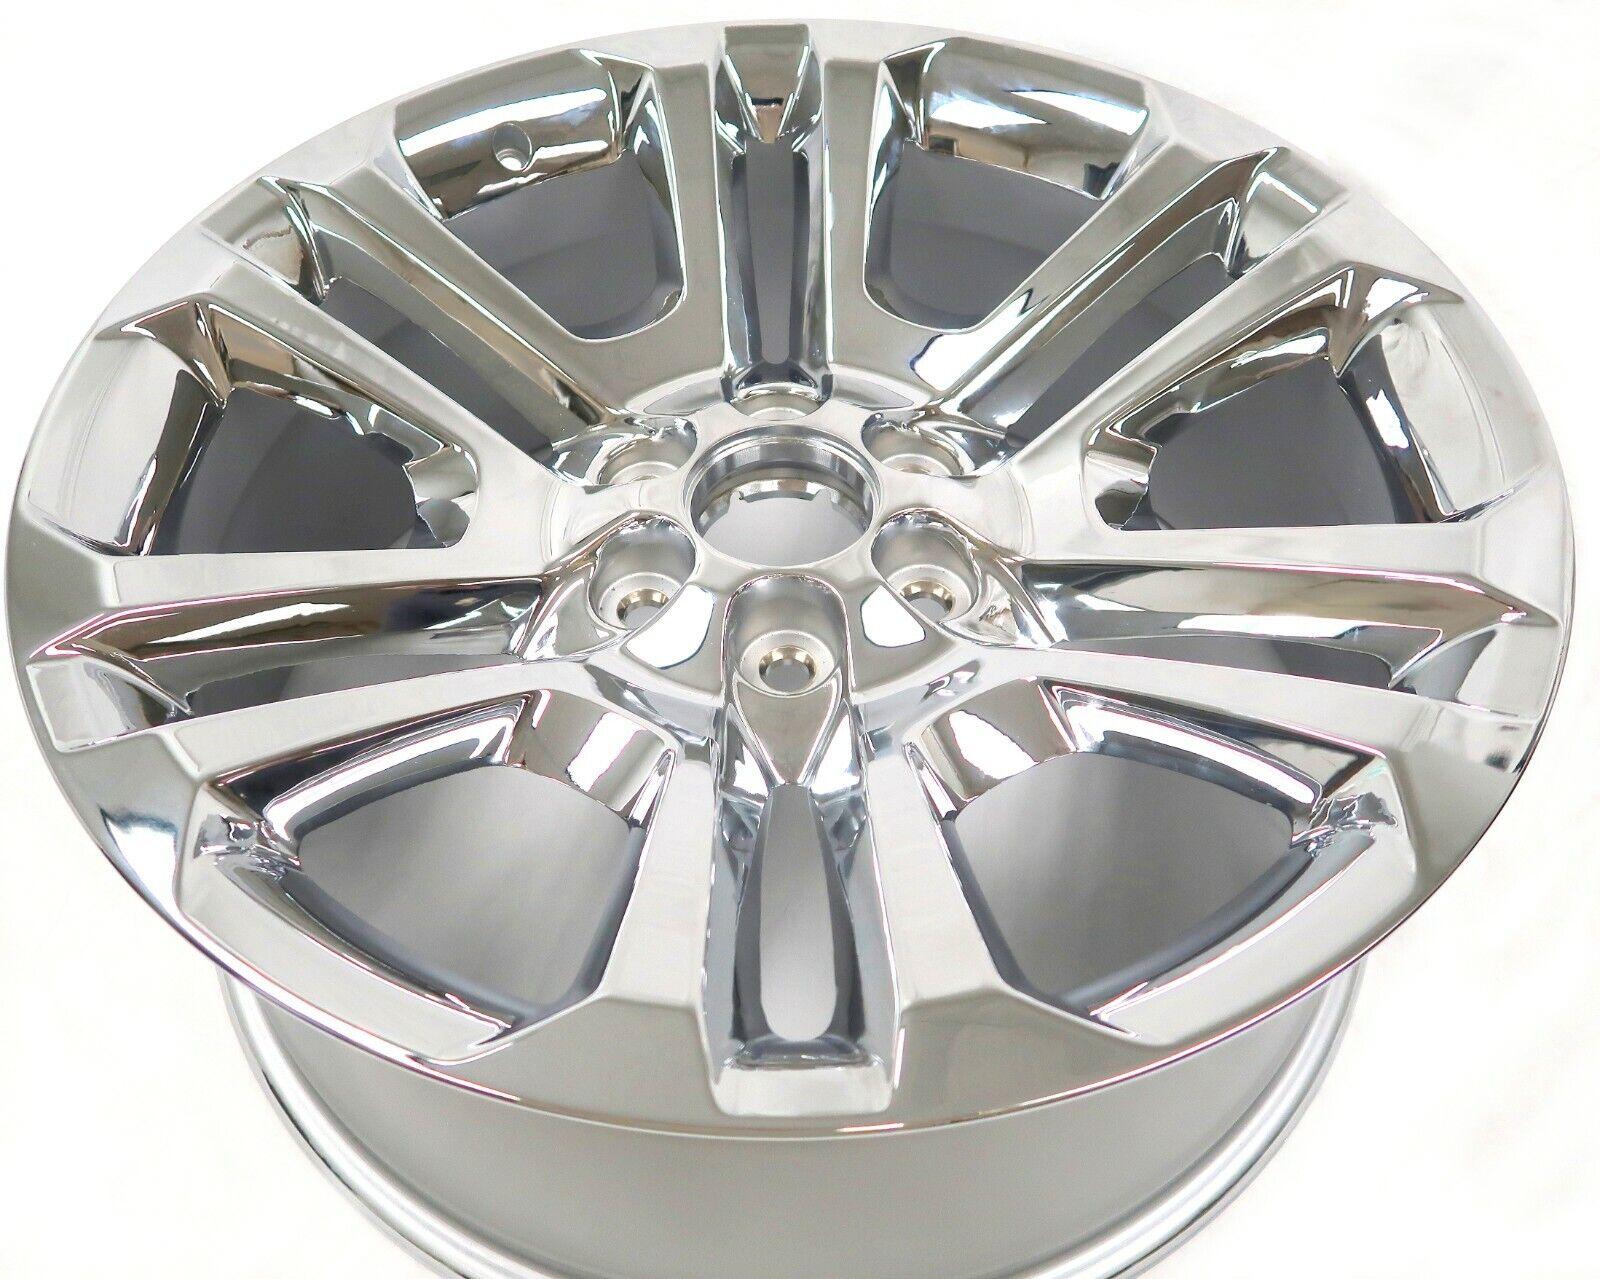 84346101 OEM 22 x 9 inch 6-Split-Spoke Aluminum Chrome Finished Wheels 4 Set NEW